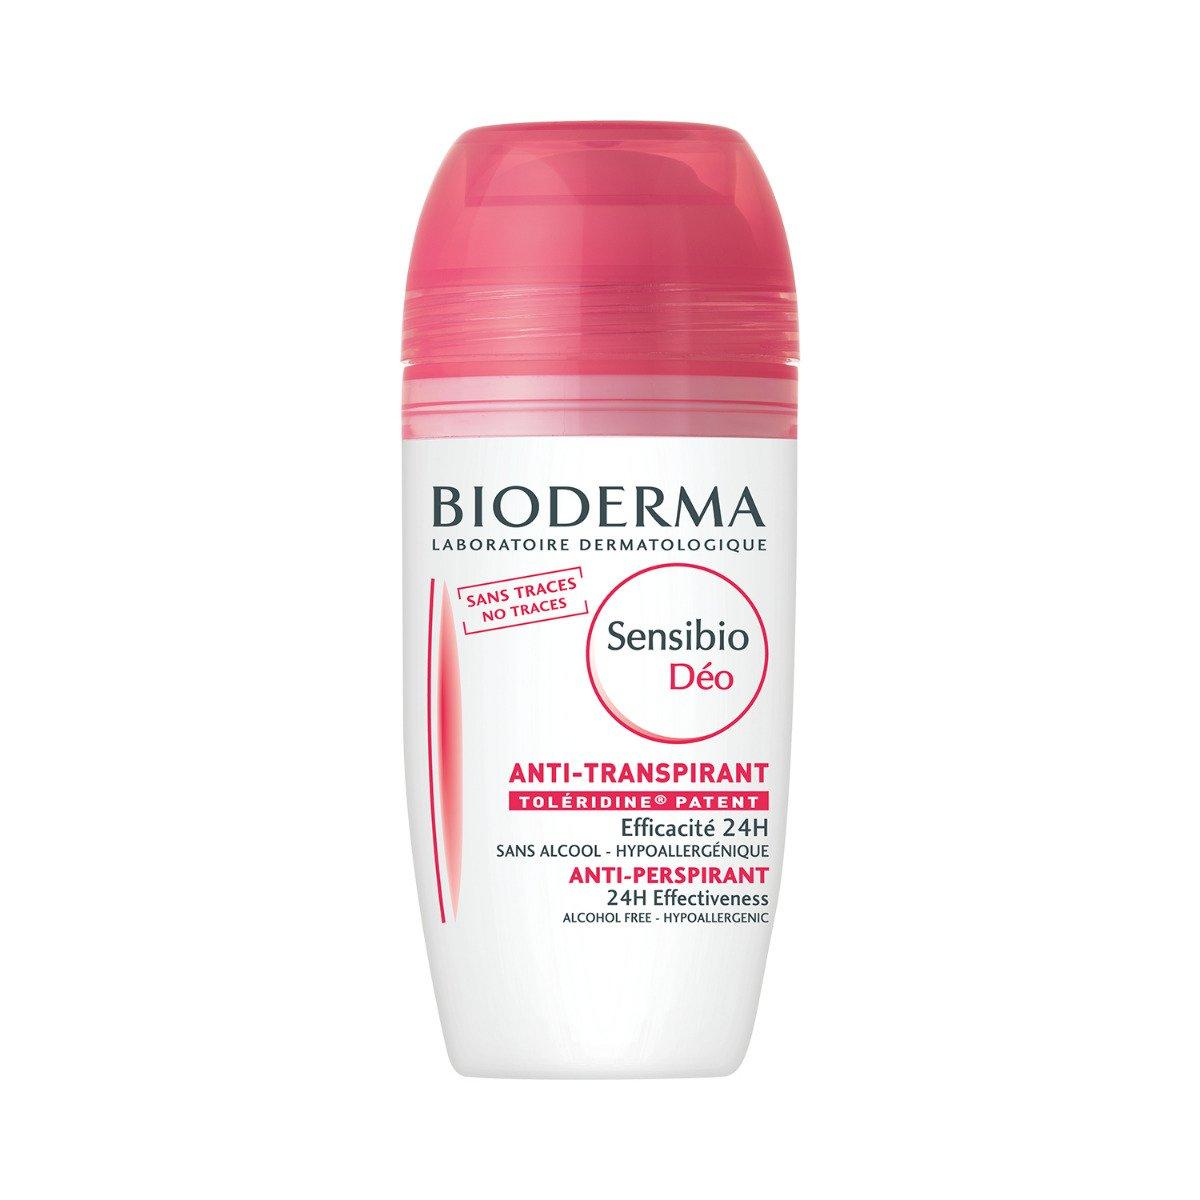 Bioderma Sensibio Déo Anti-transpirant